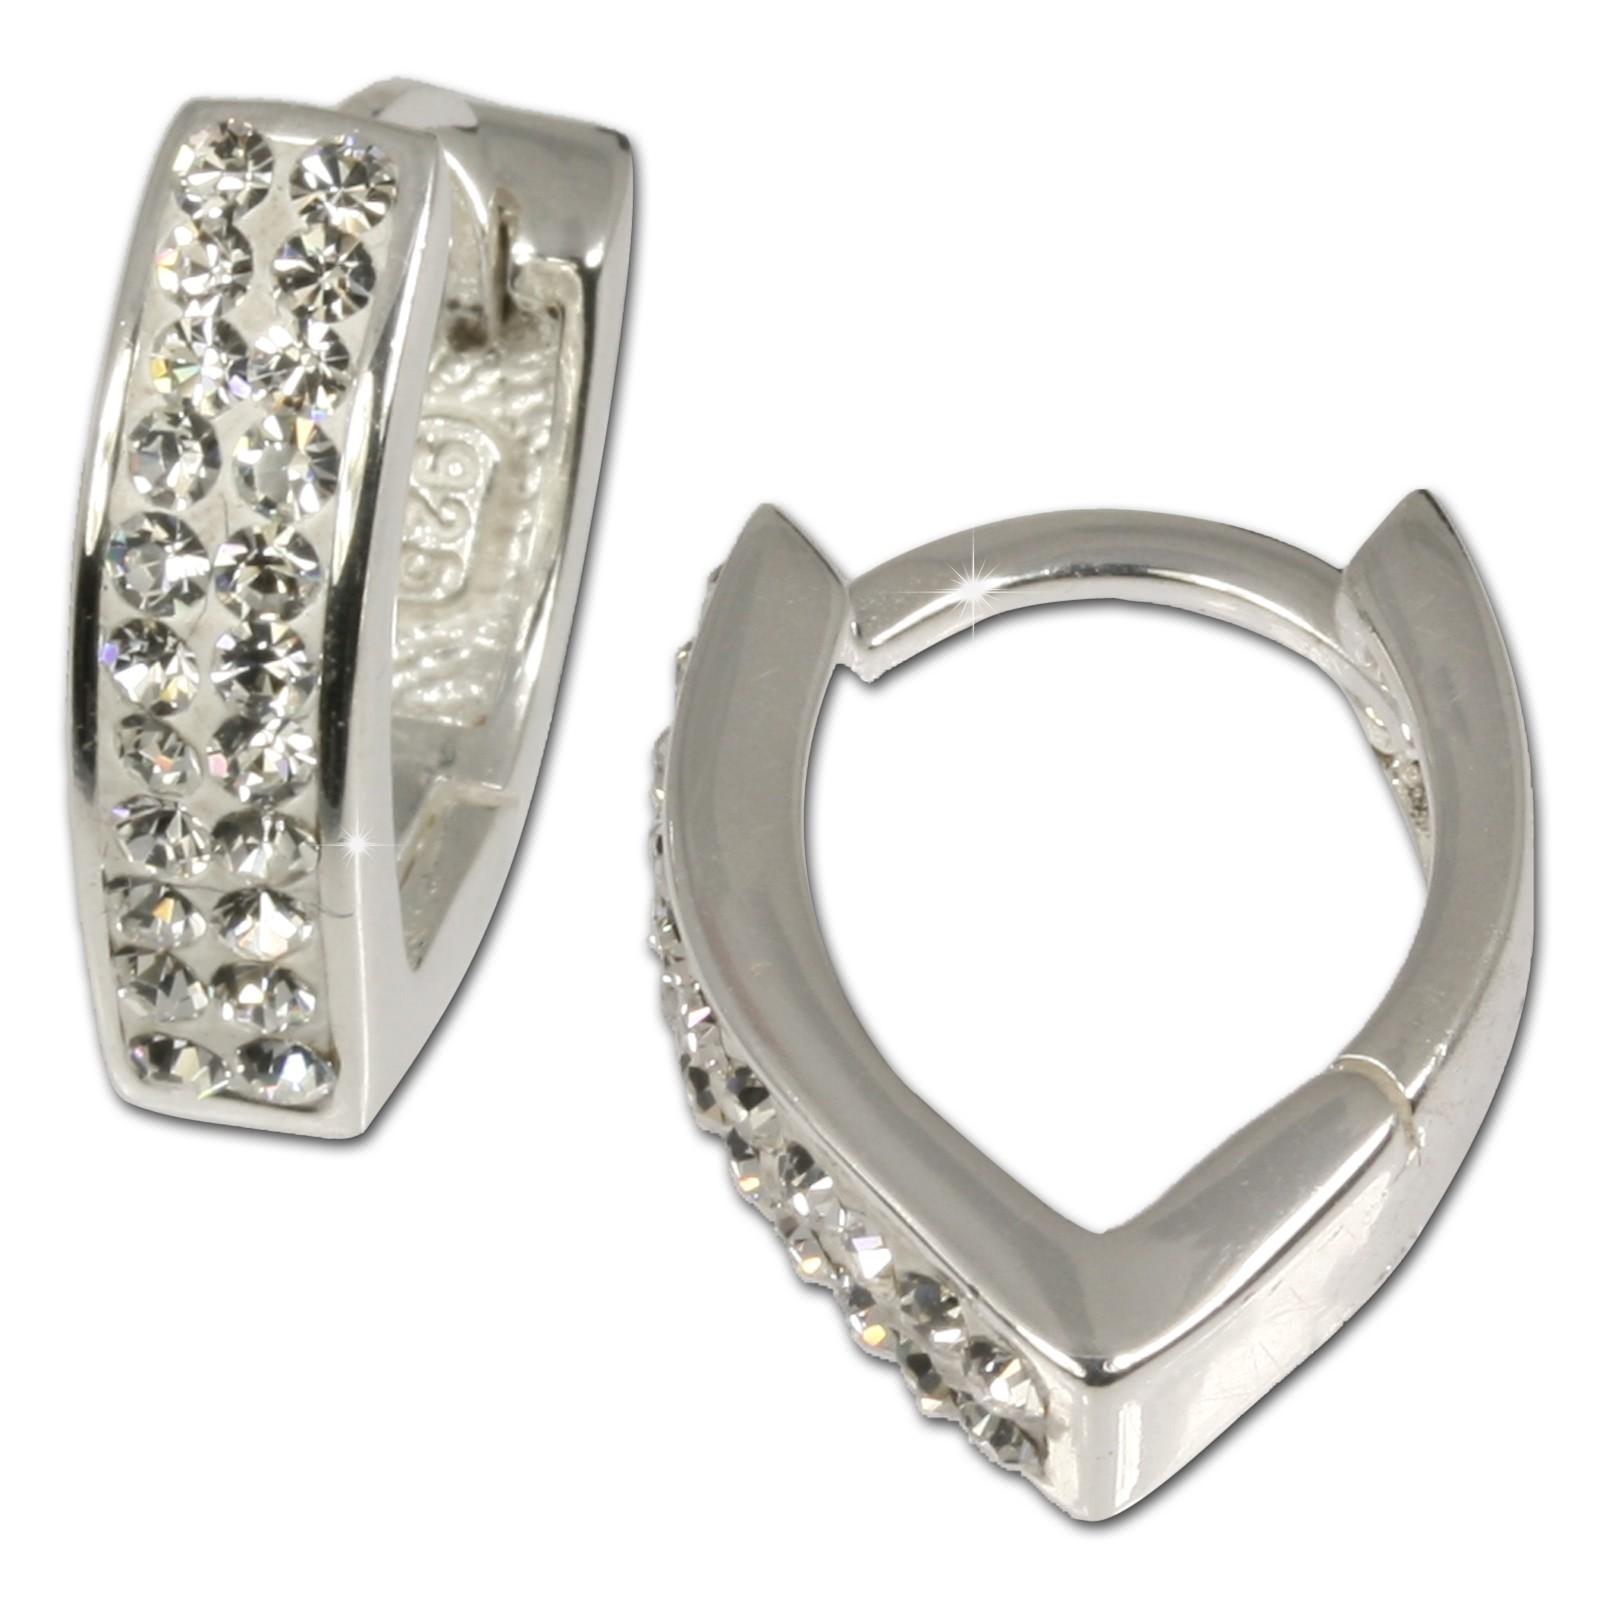 SilberDream Creole Herz Zirkonia weiß 925 Silber Ohrring SDO310W